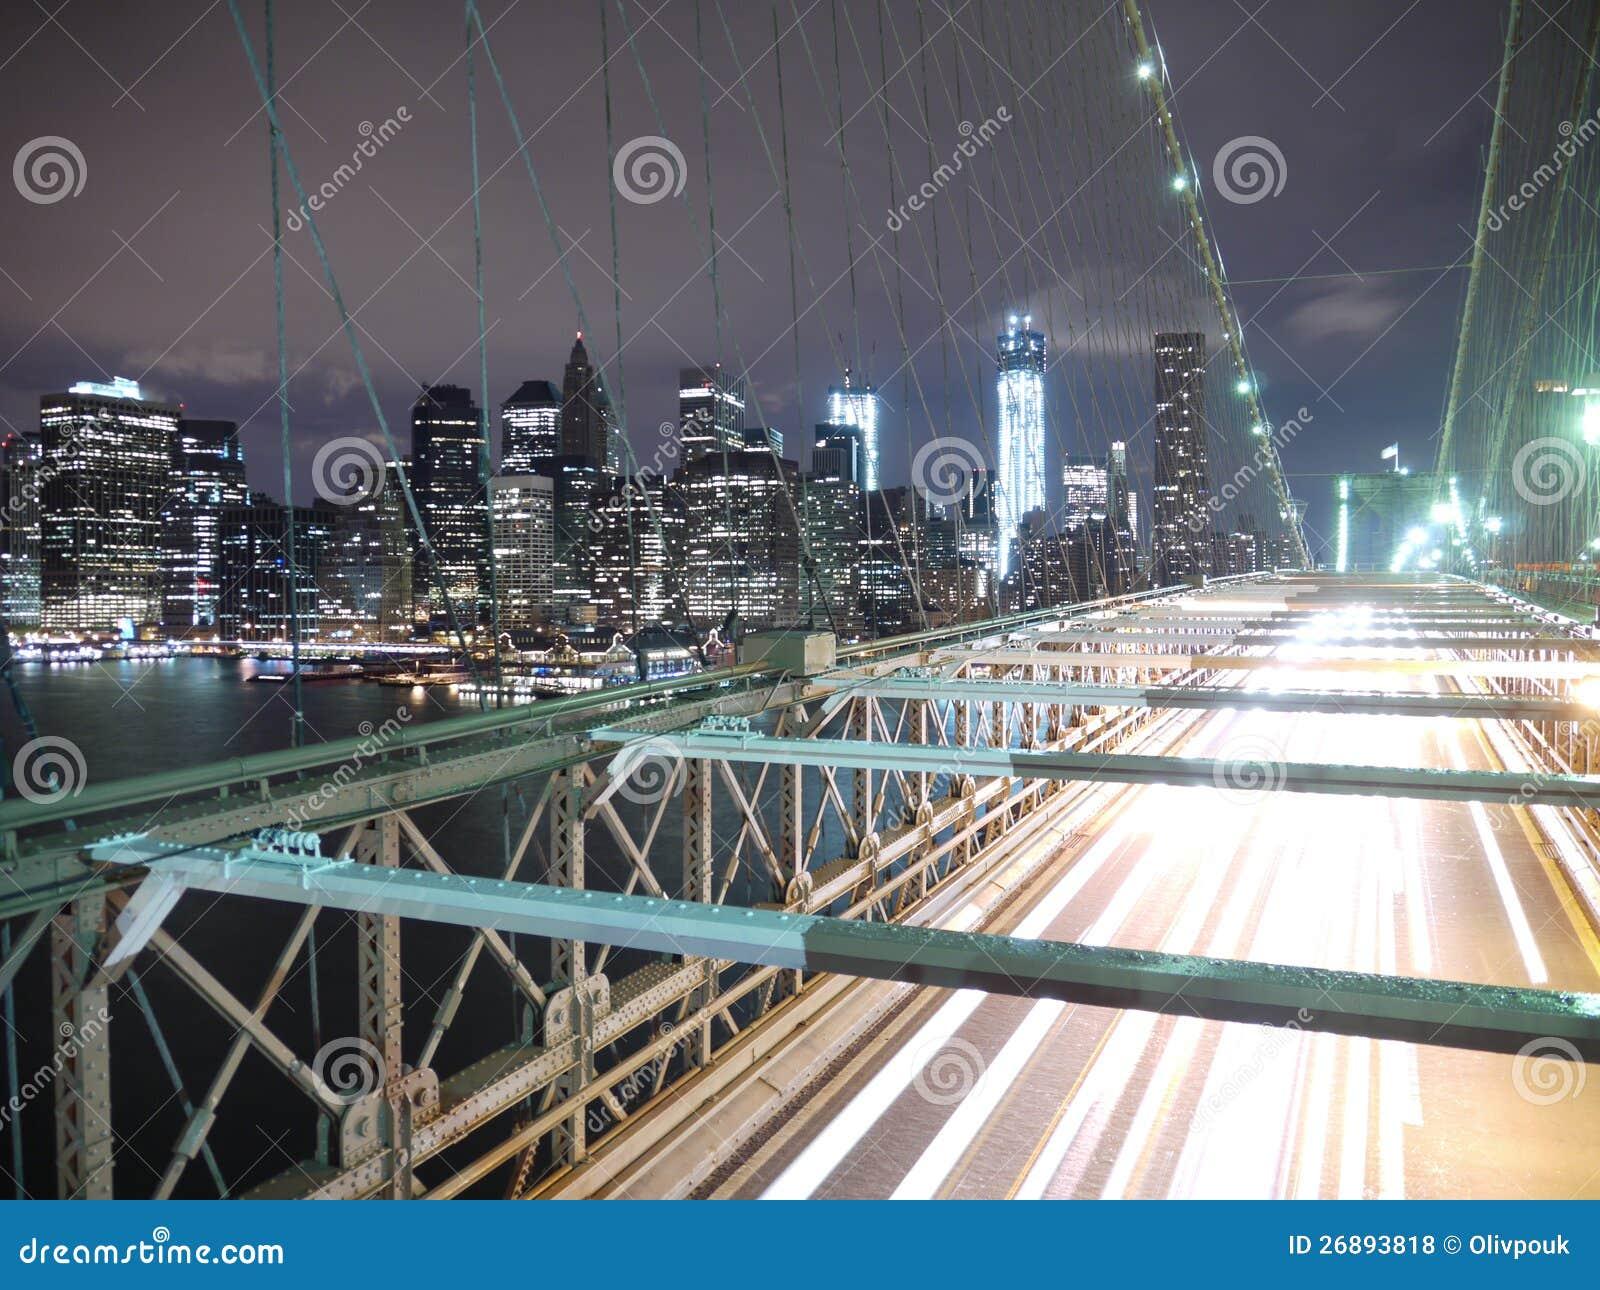 New York Brooklyn Bridge At Night Stock Photo Image Of Landscape